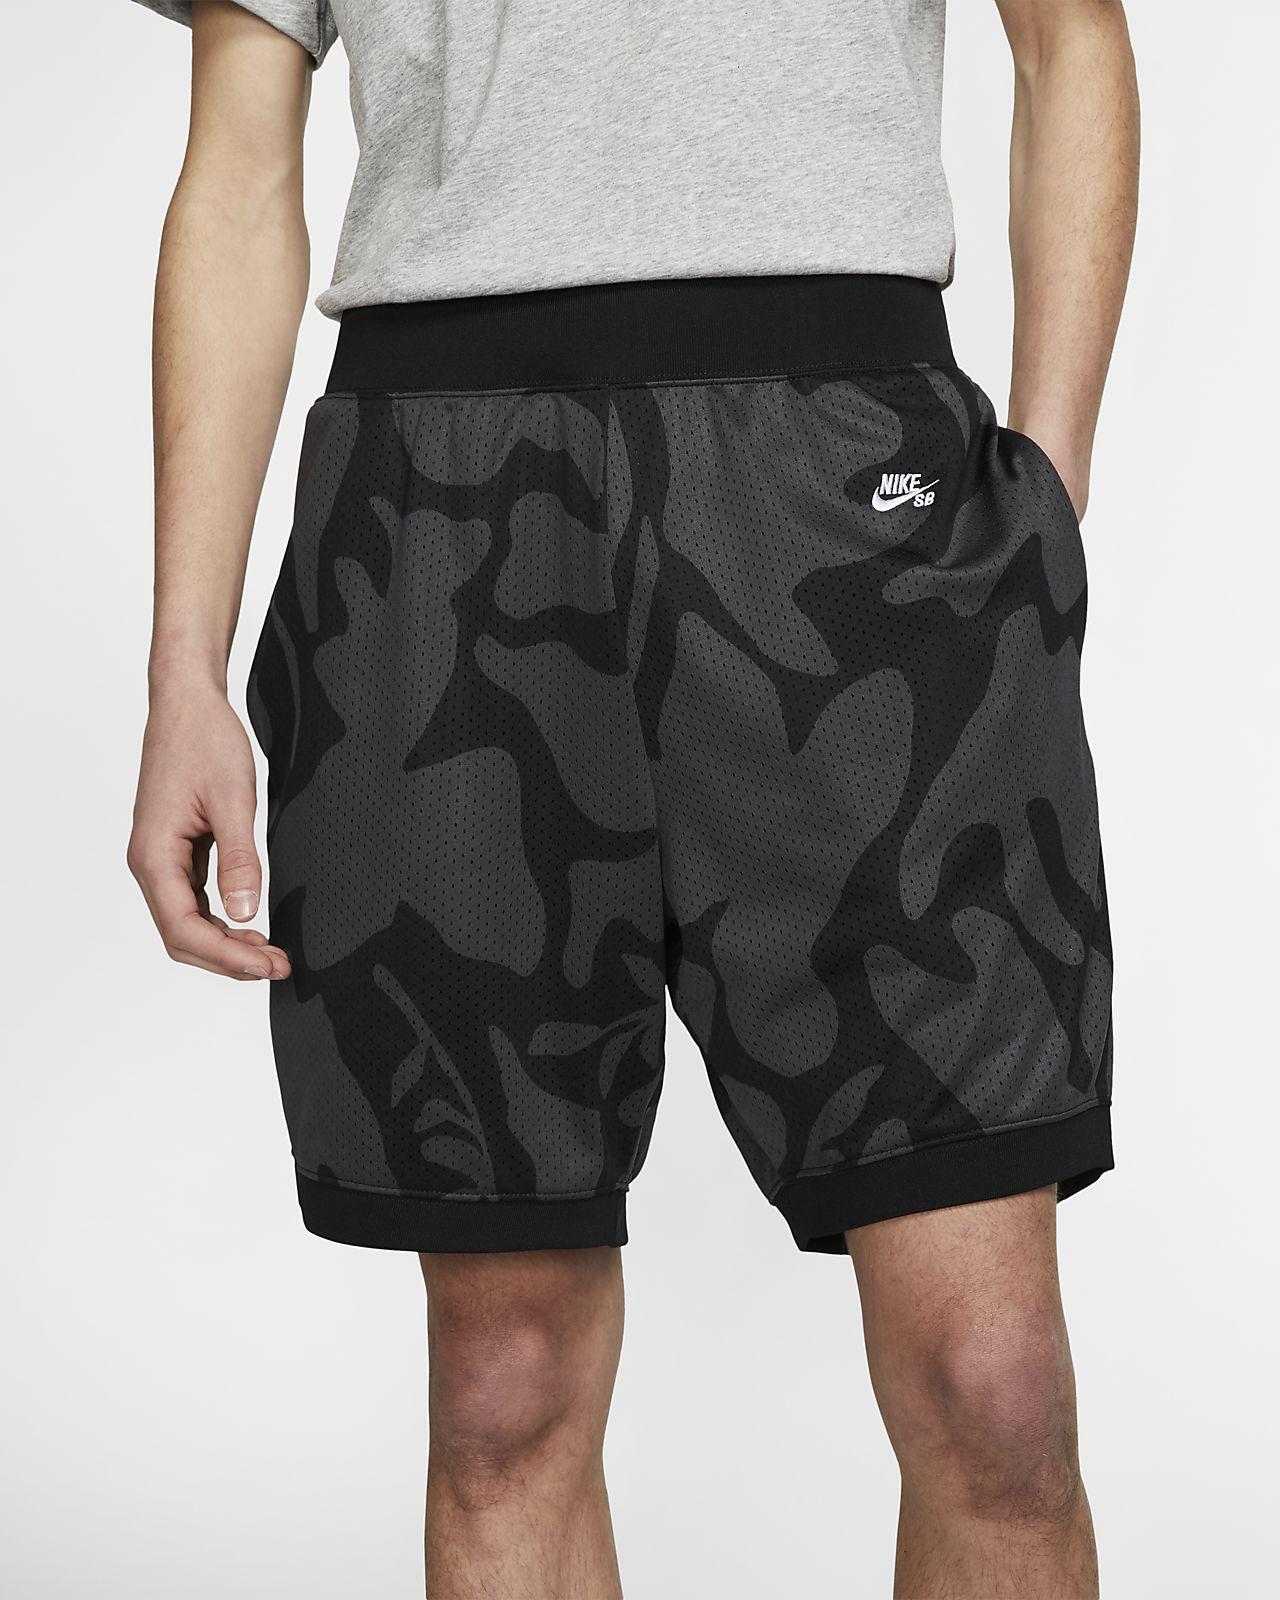 Nike SB Dri-FIT Men's Printed Skate Shorts